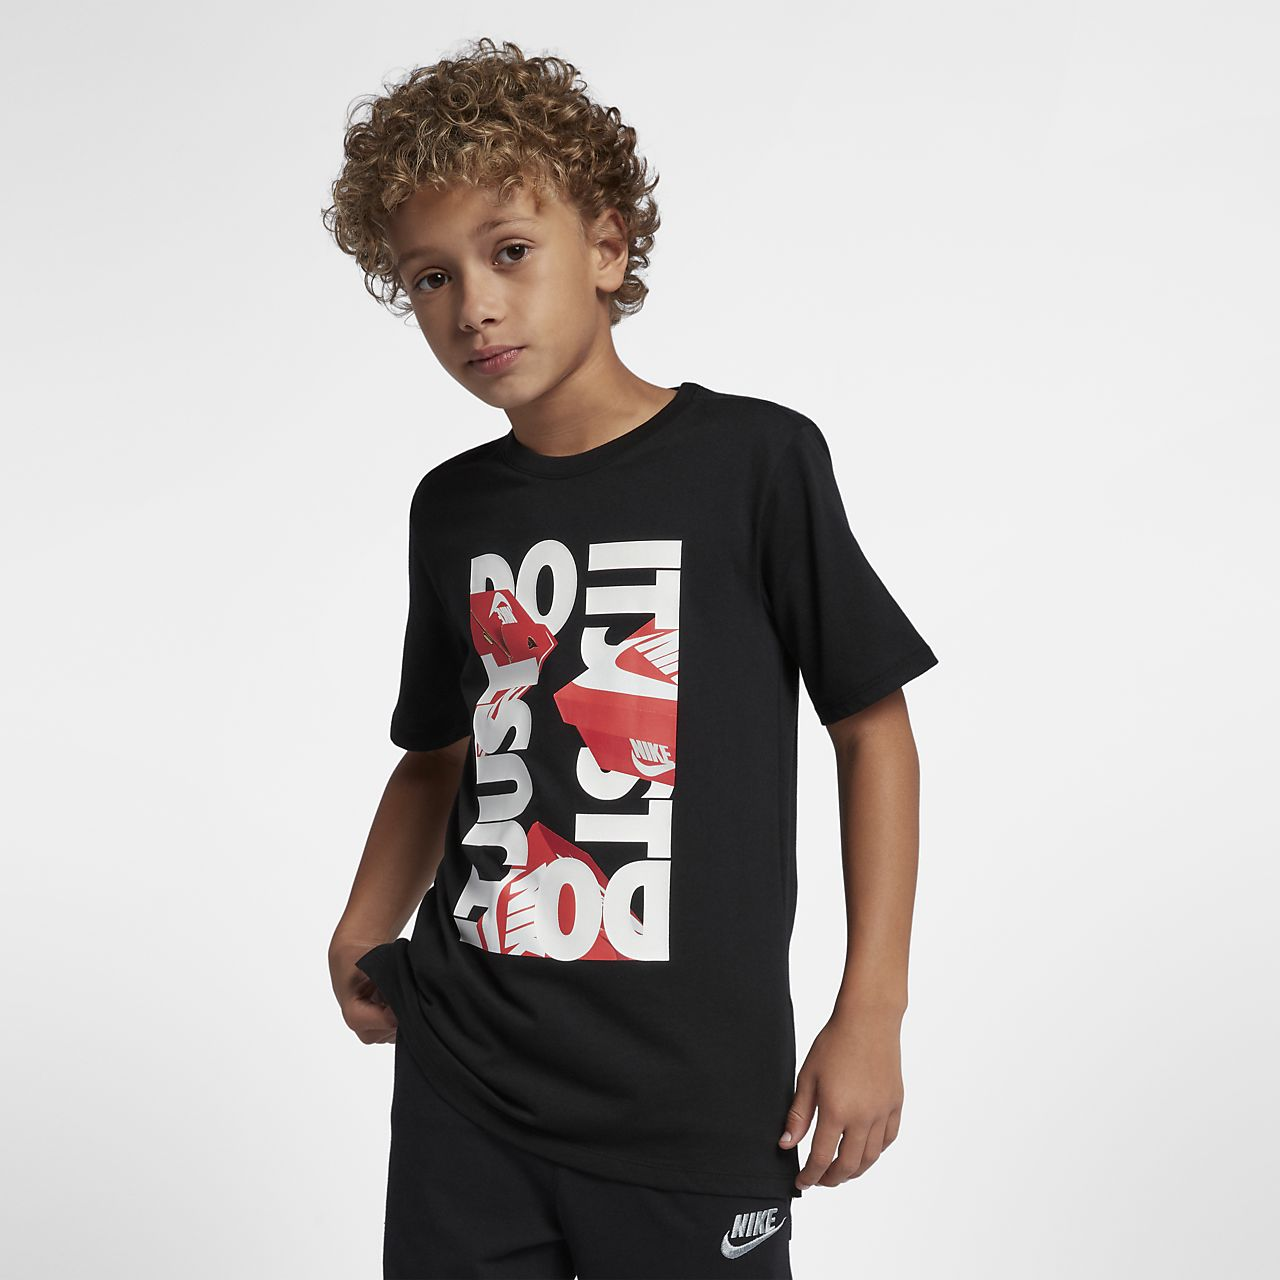 Nike Sportswear Just Do It T Shirt für ältere Kinder (Jungen)